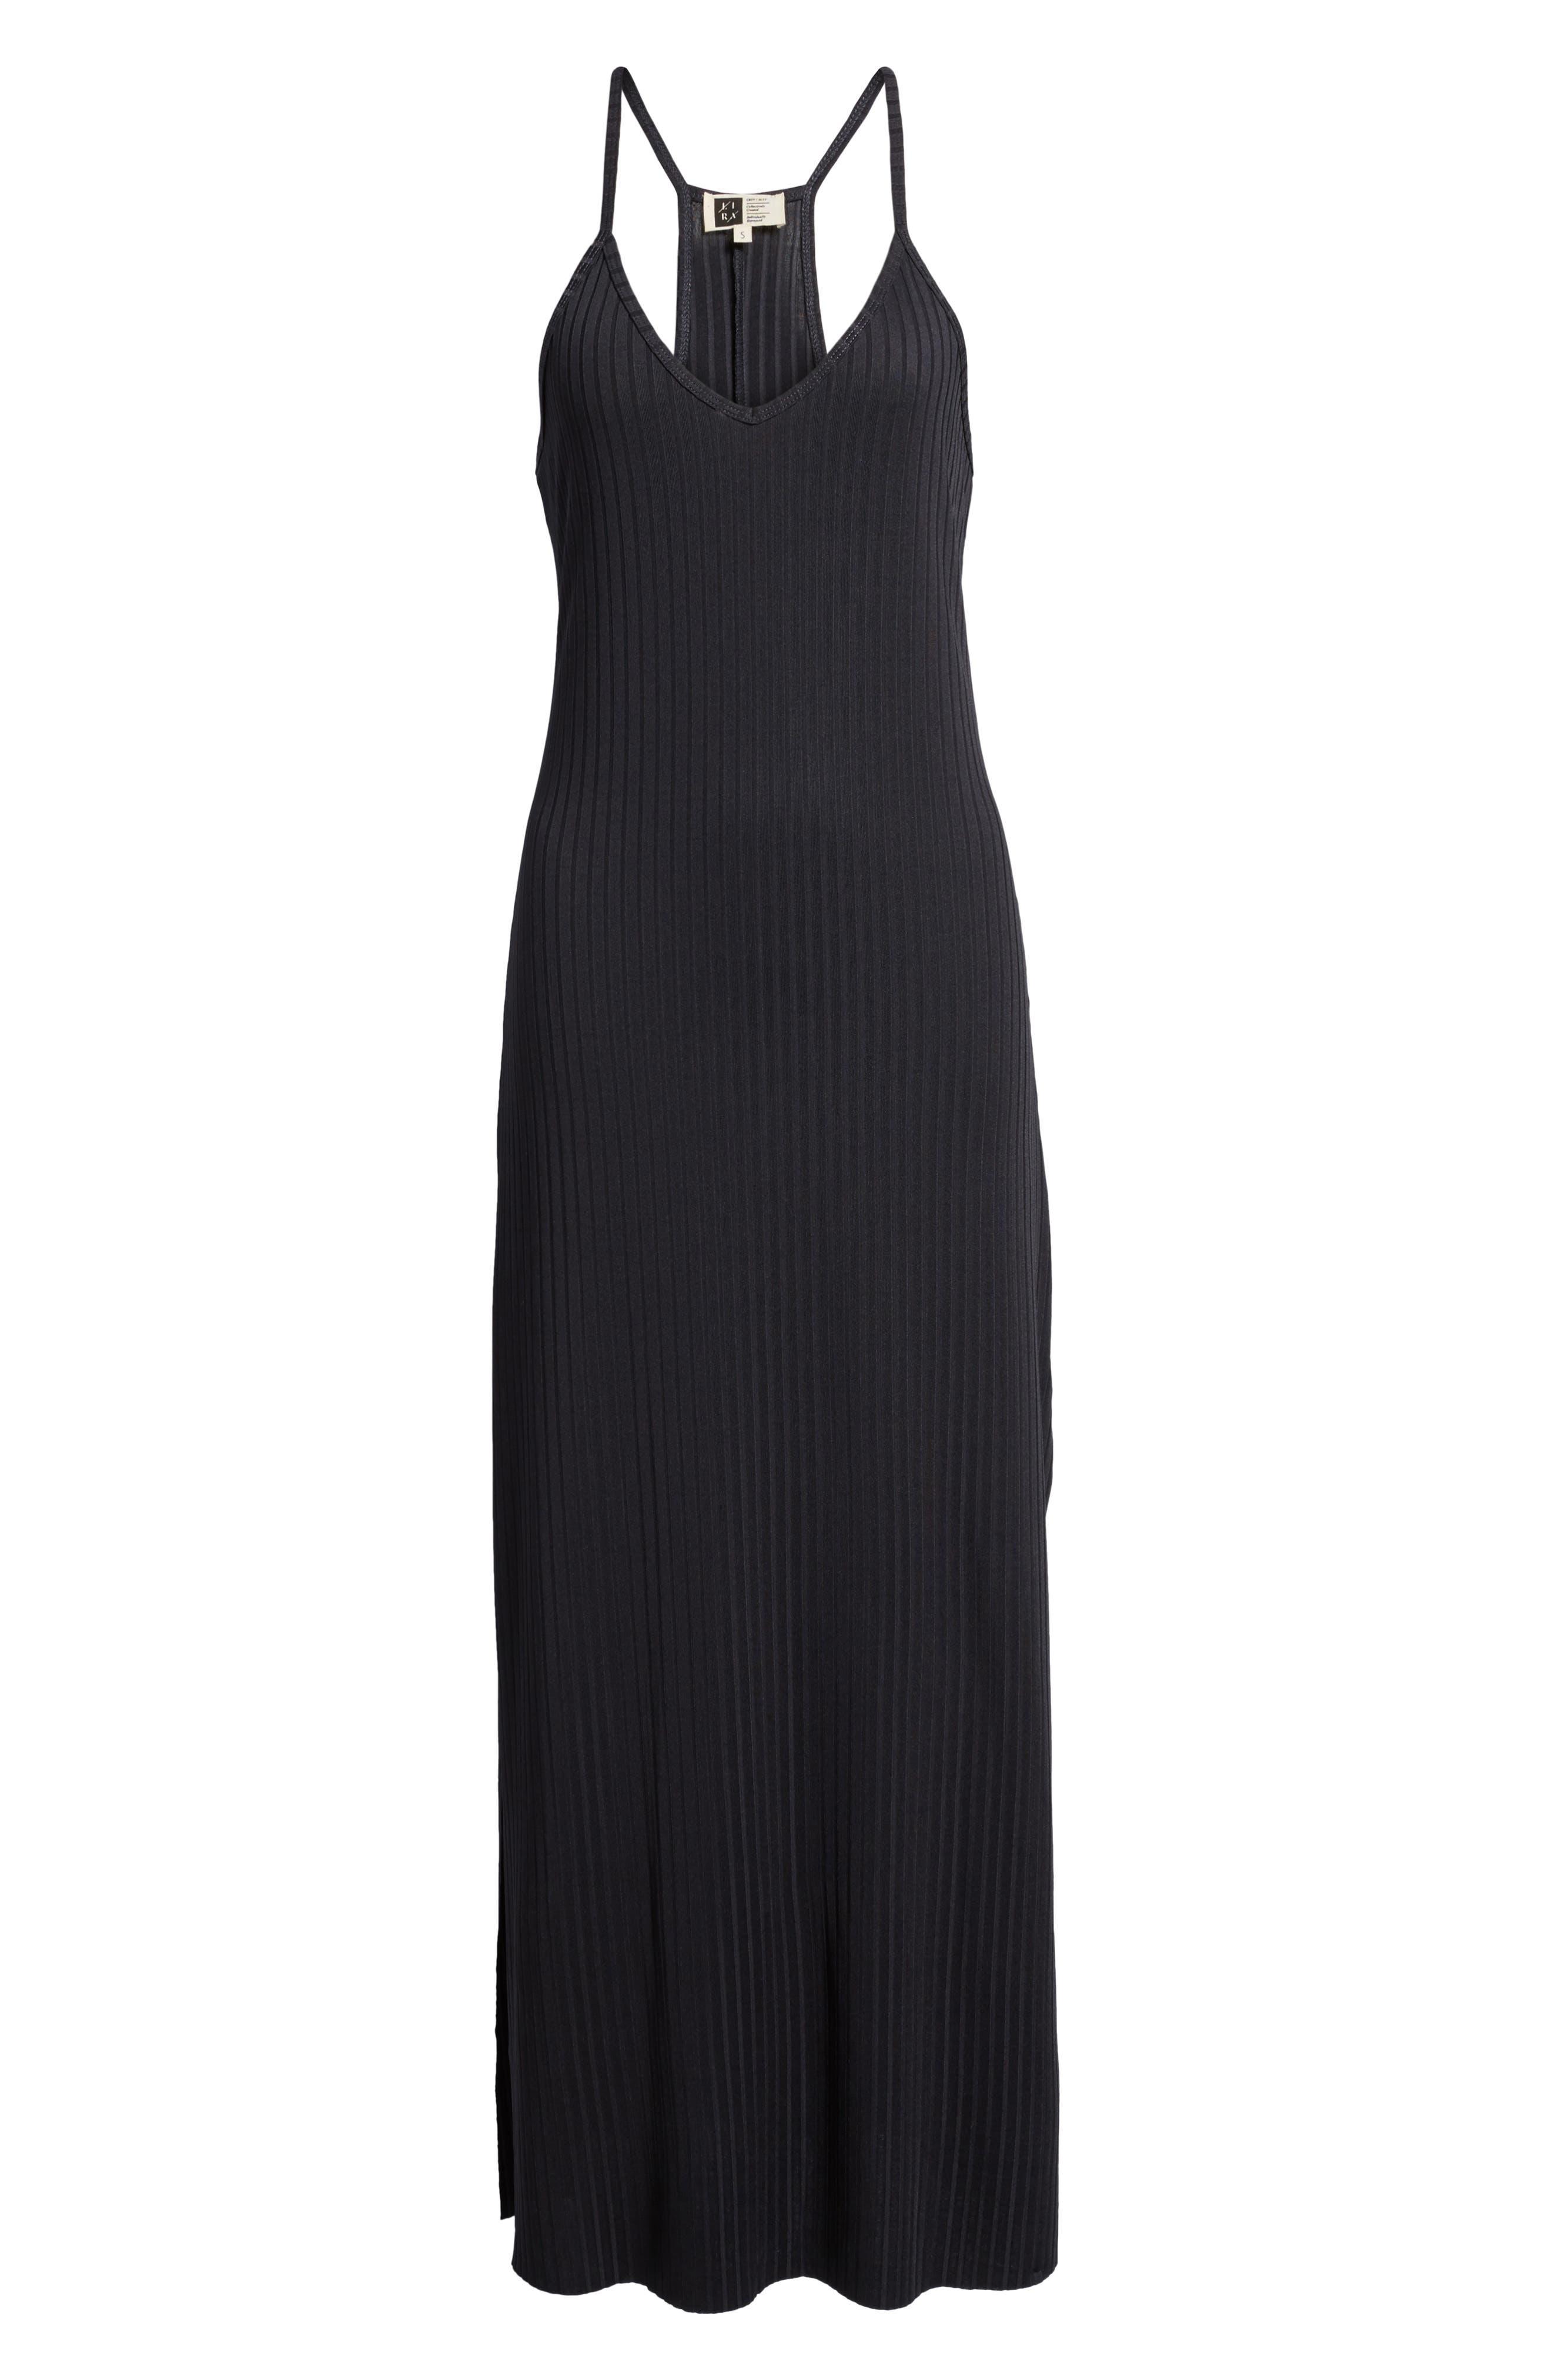 Ashlynn Ribbed Maxi Dress,                             Alternate thumbnail 6, color,                             401